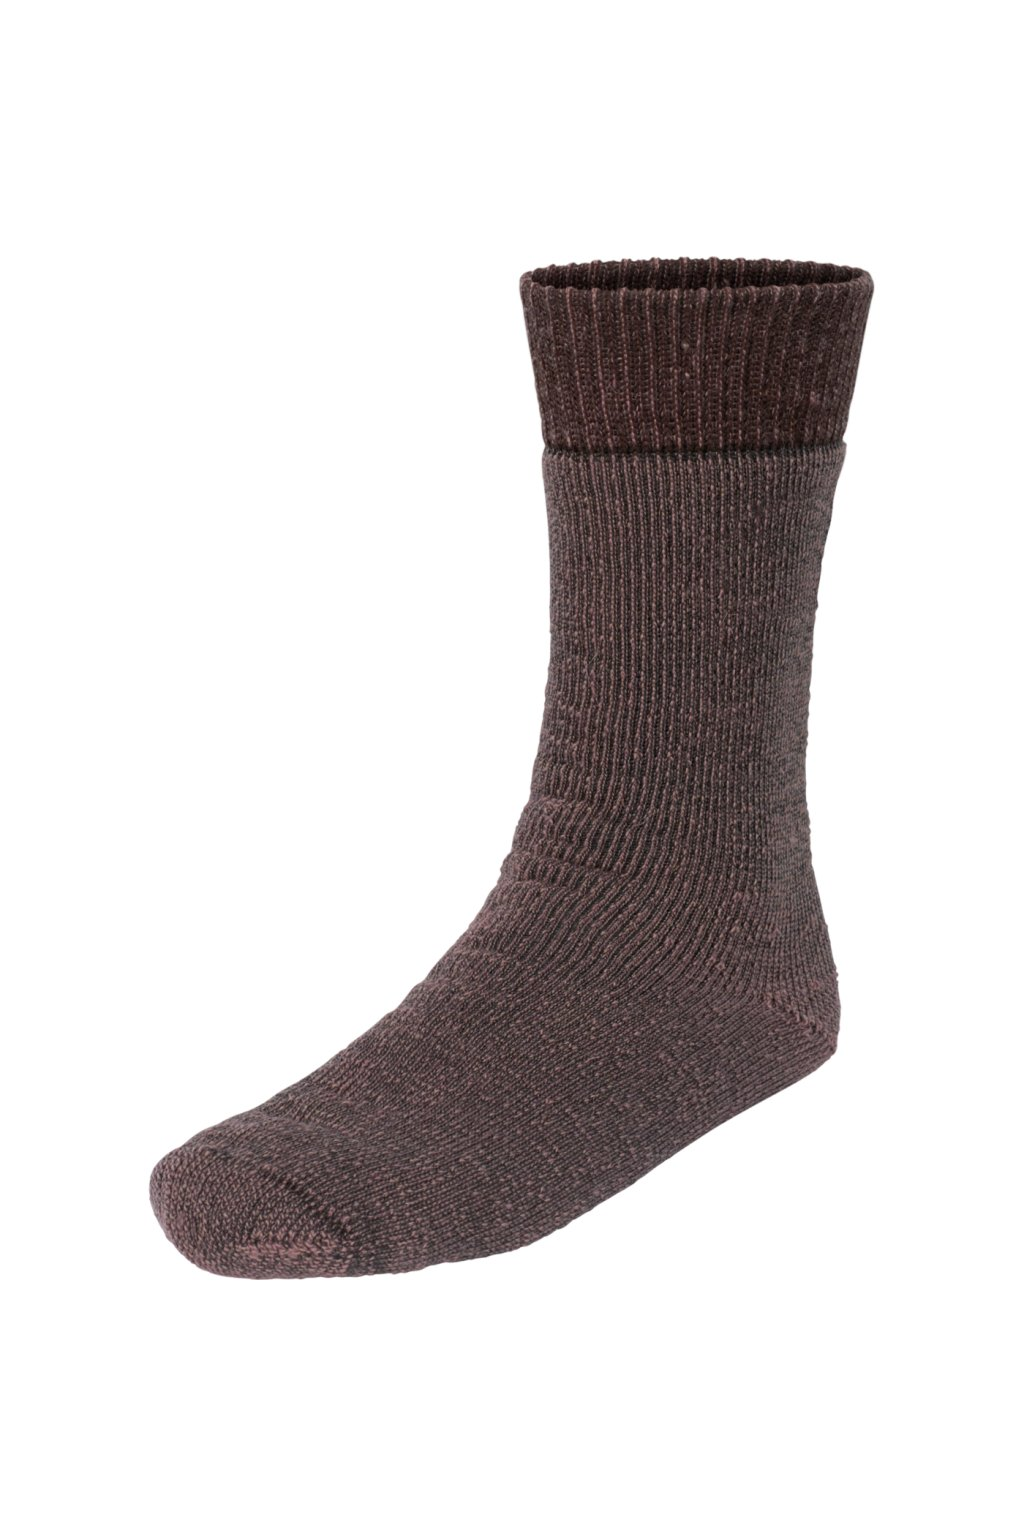 Seeland - Climate ponožky